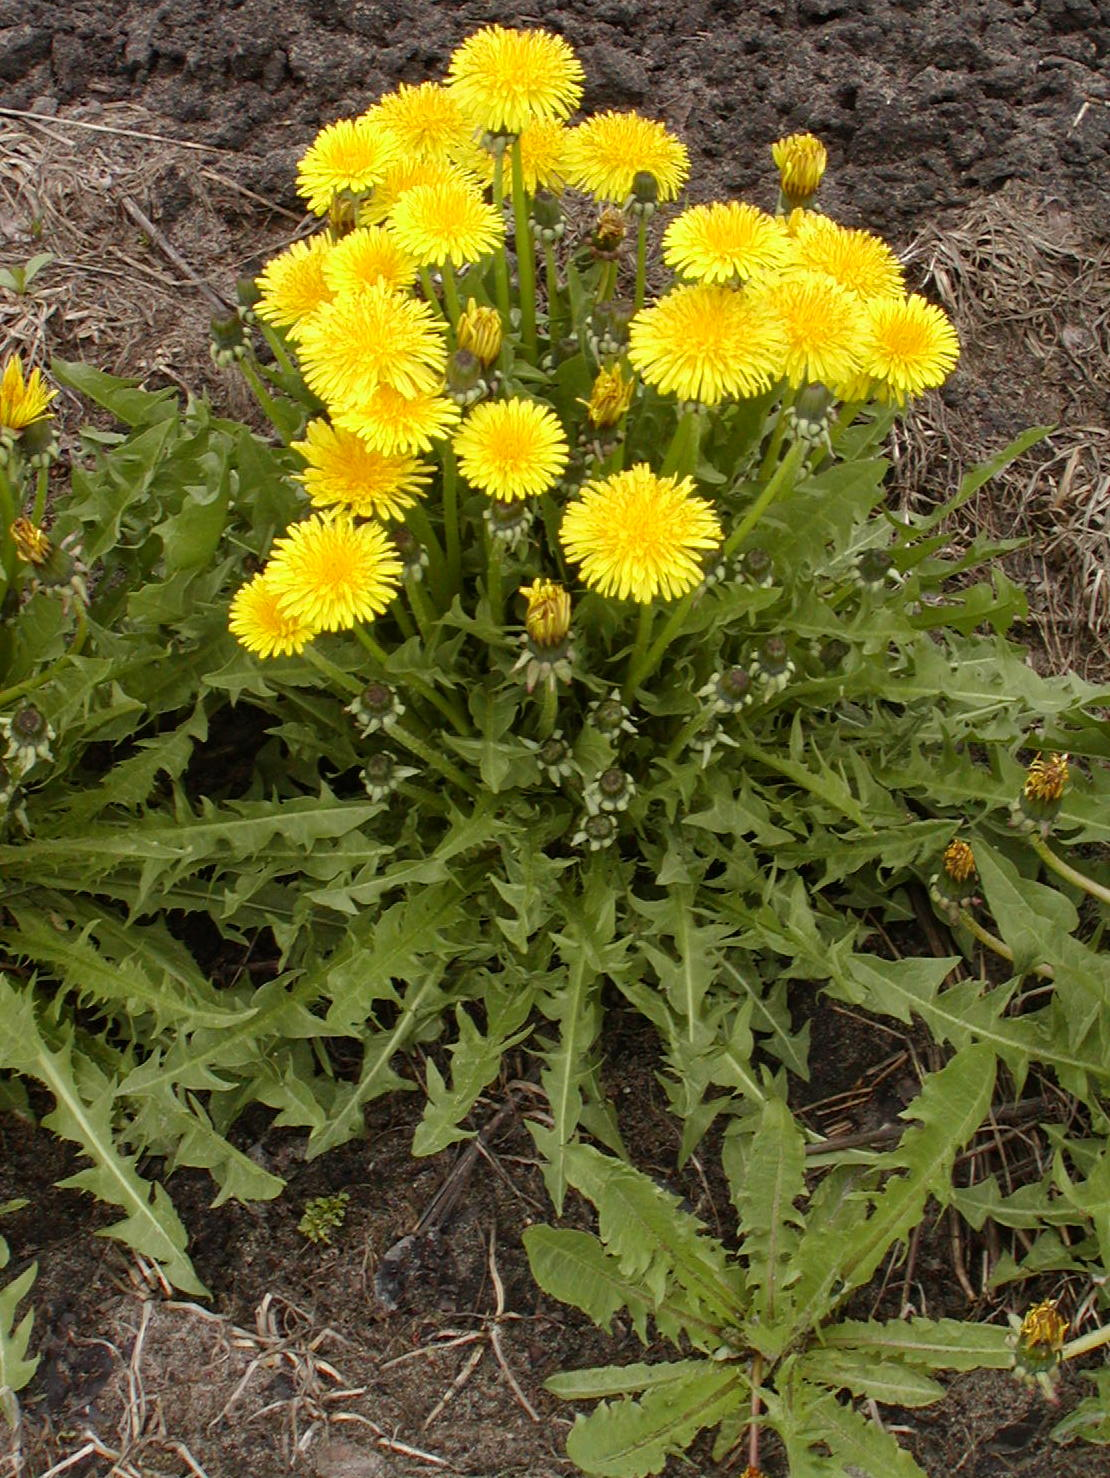 Dandelion - Taraxacum officinale - Plant & Pest Diagnostics